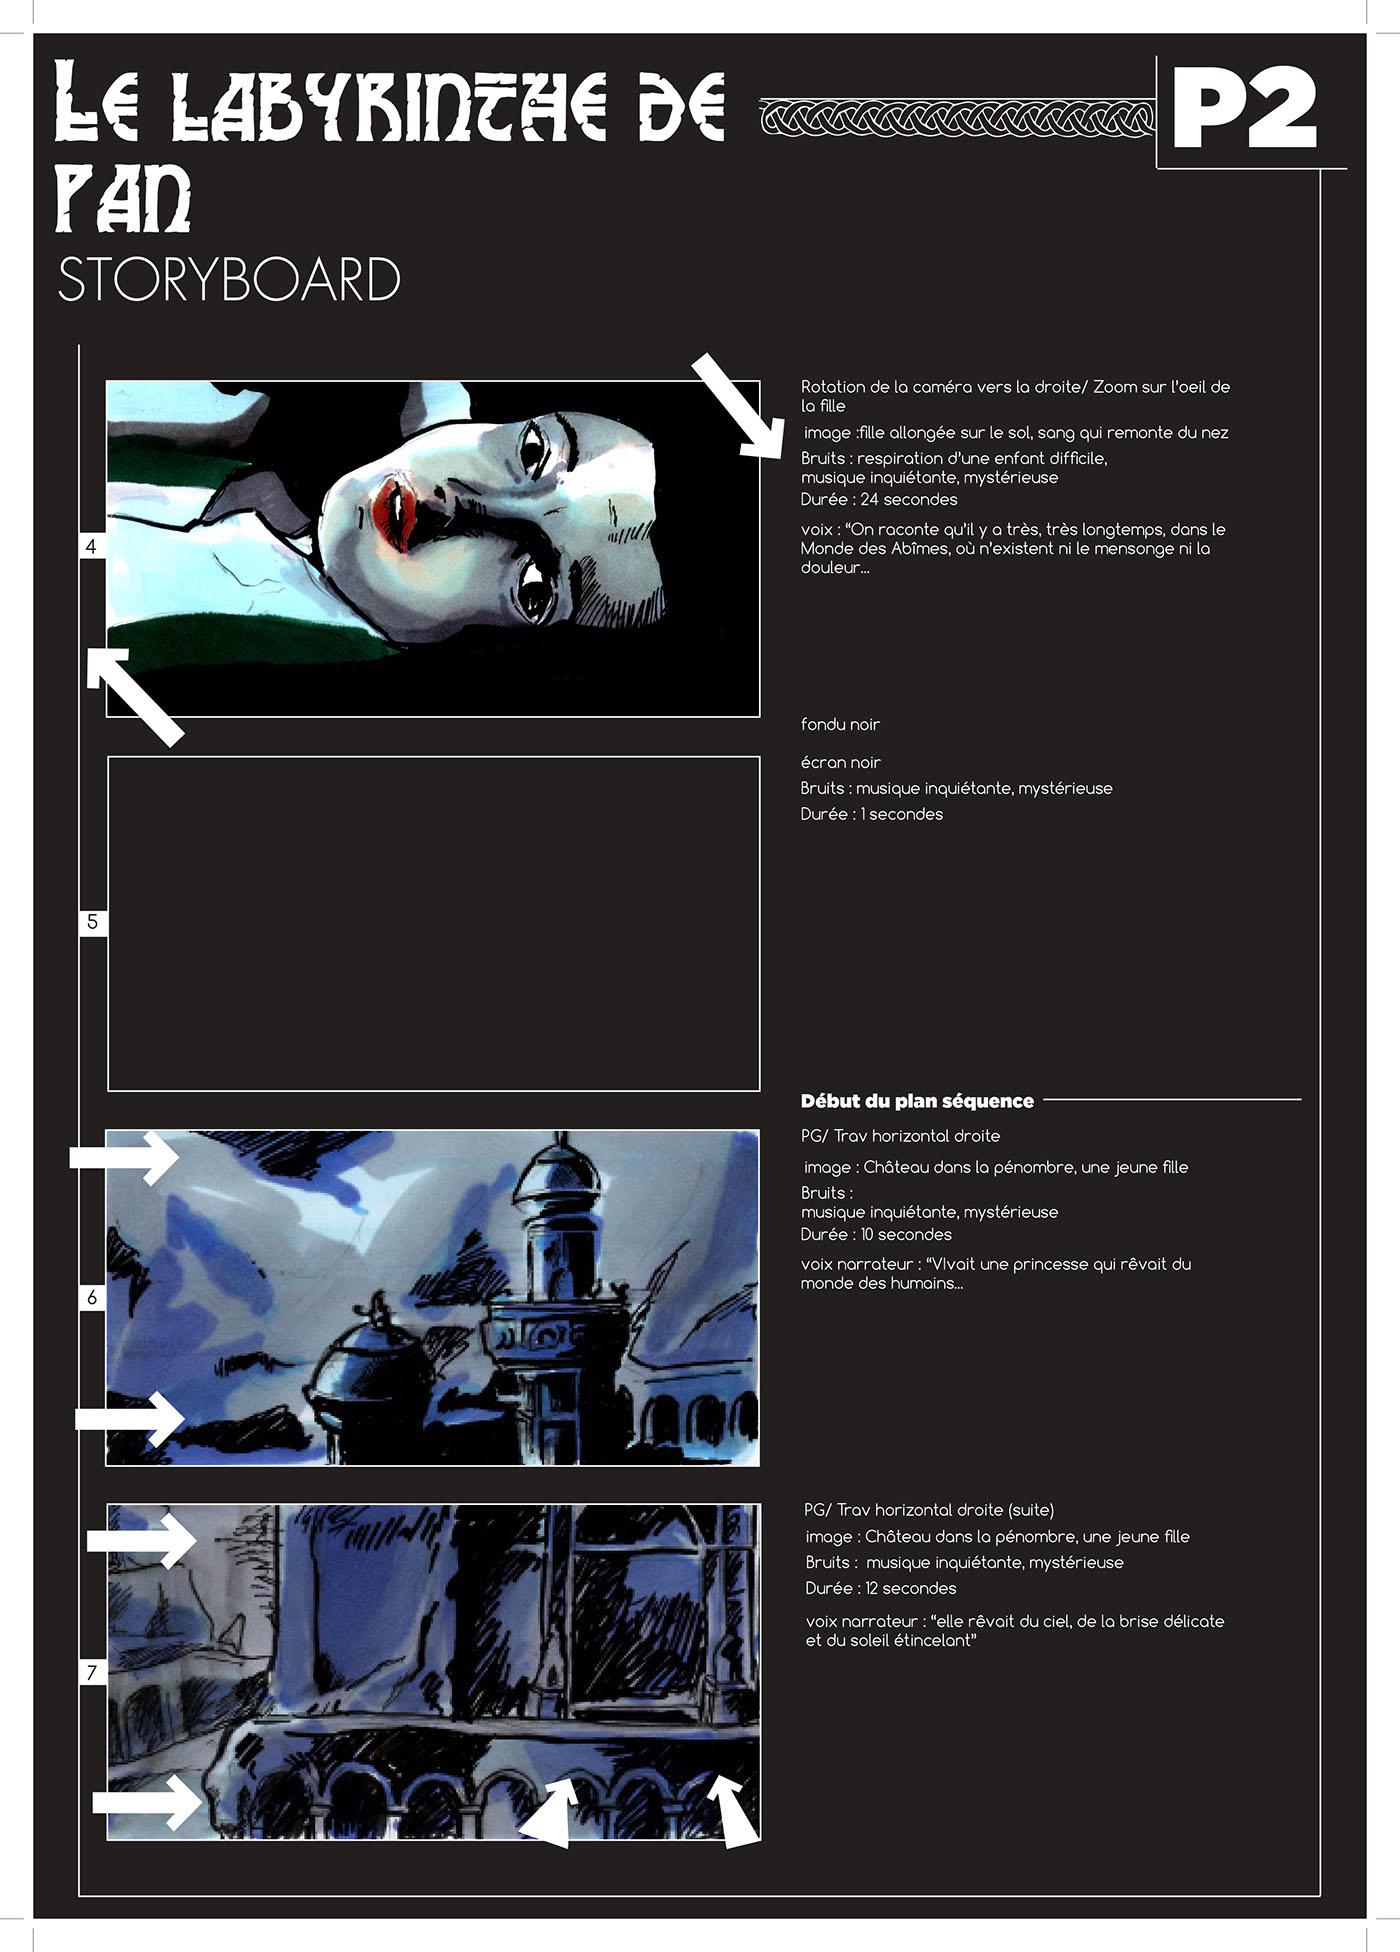 Labyrinthe De Pan Story-Board On Behance encequiconcerne Labyrinthe Difficile